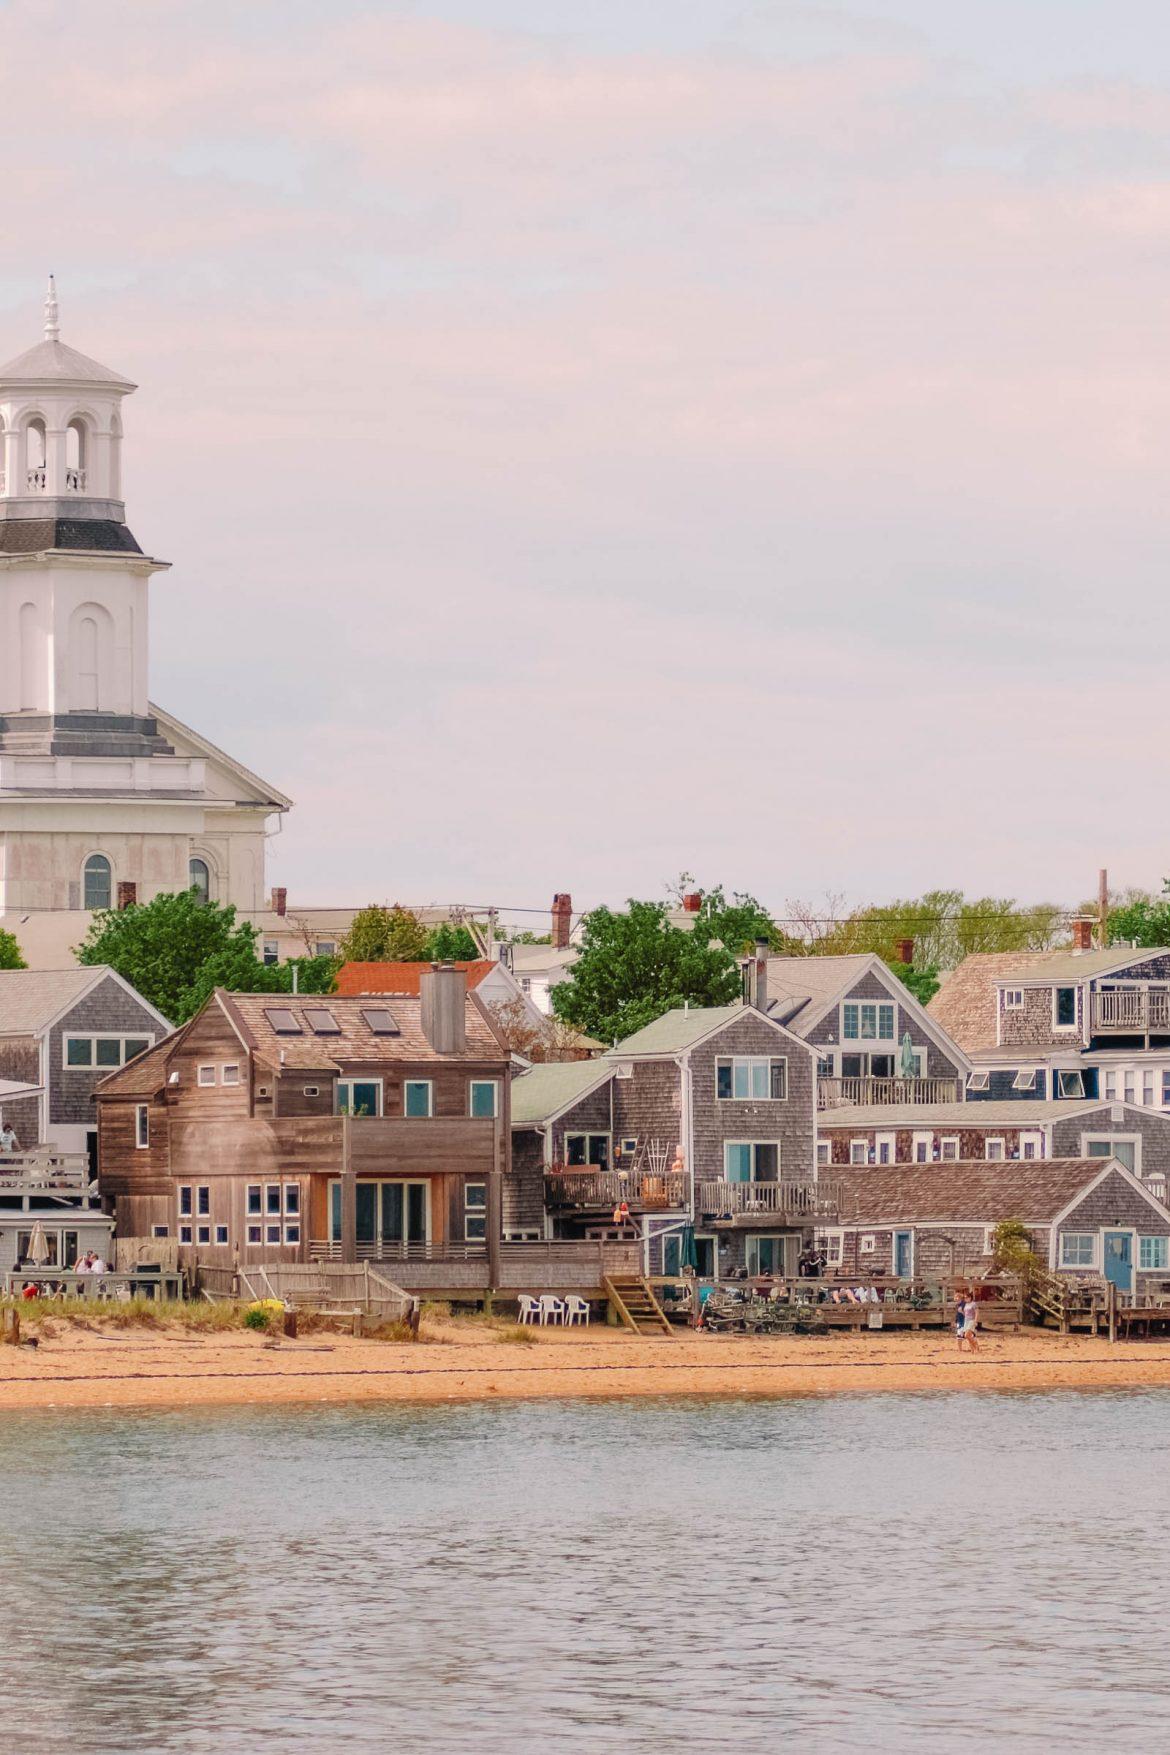 11 лучших занятий на Кейп-Коде, штат Массачусетс